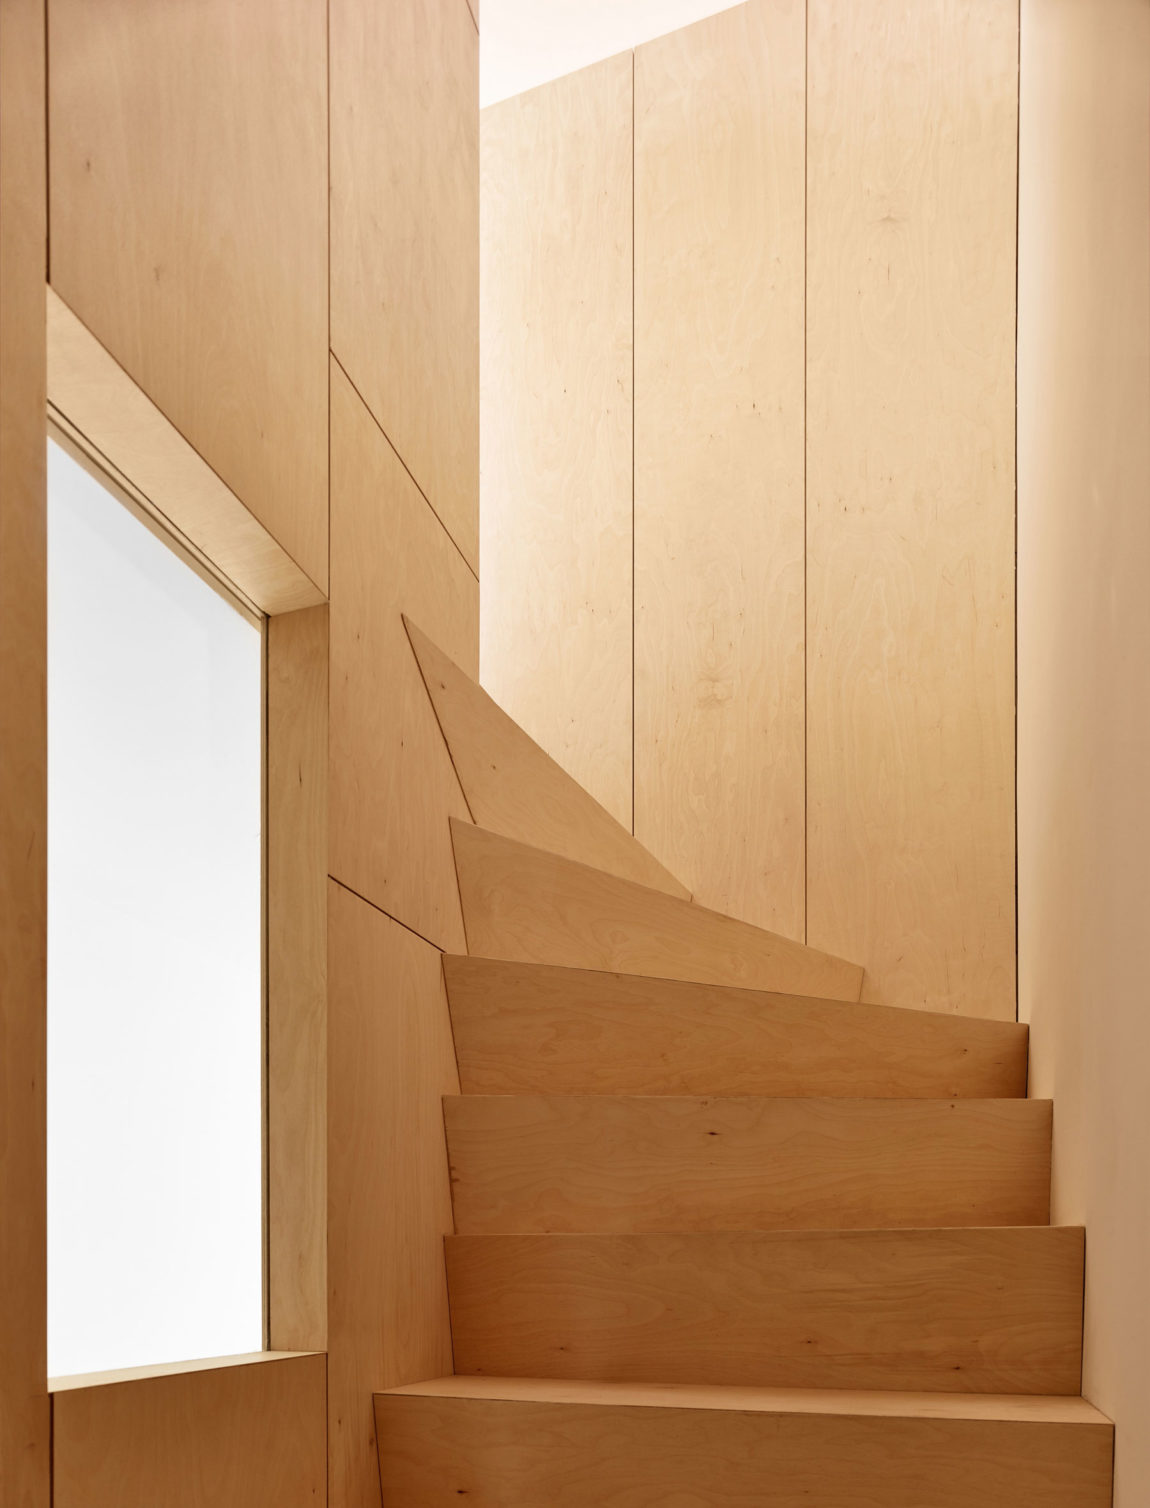 Home in Schaerbeek by Martens/Brunet Architects (15)